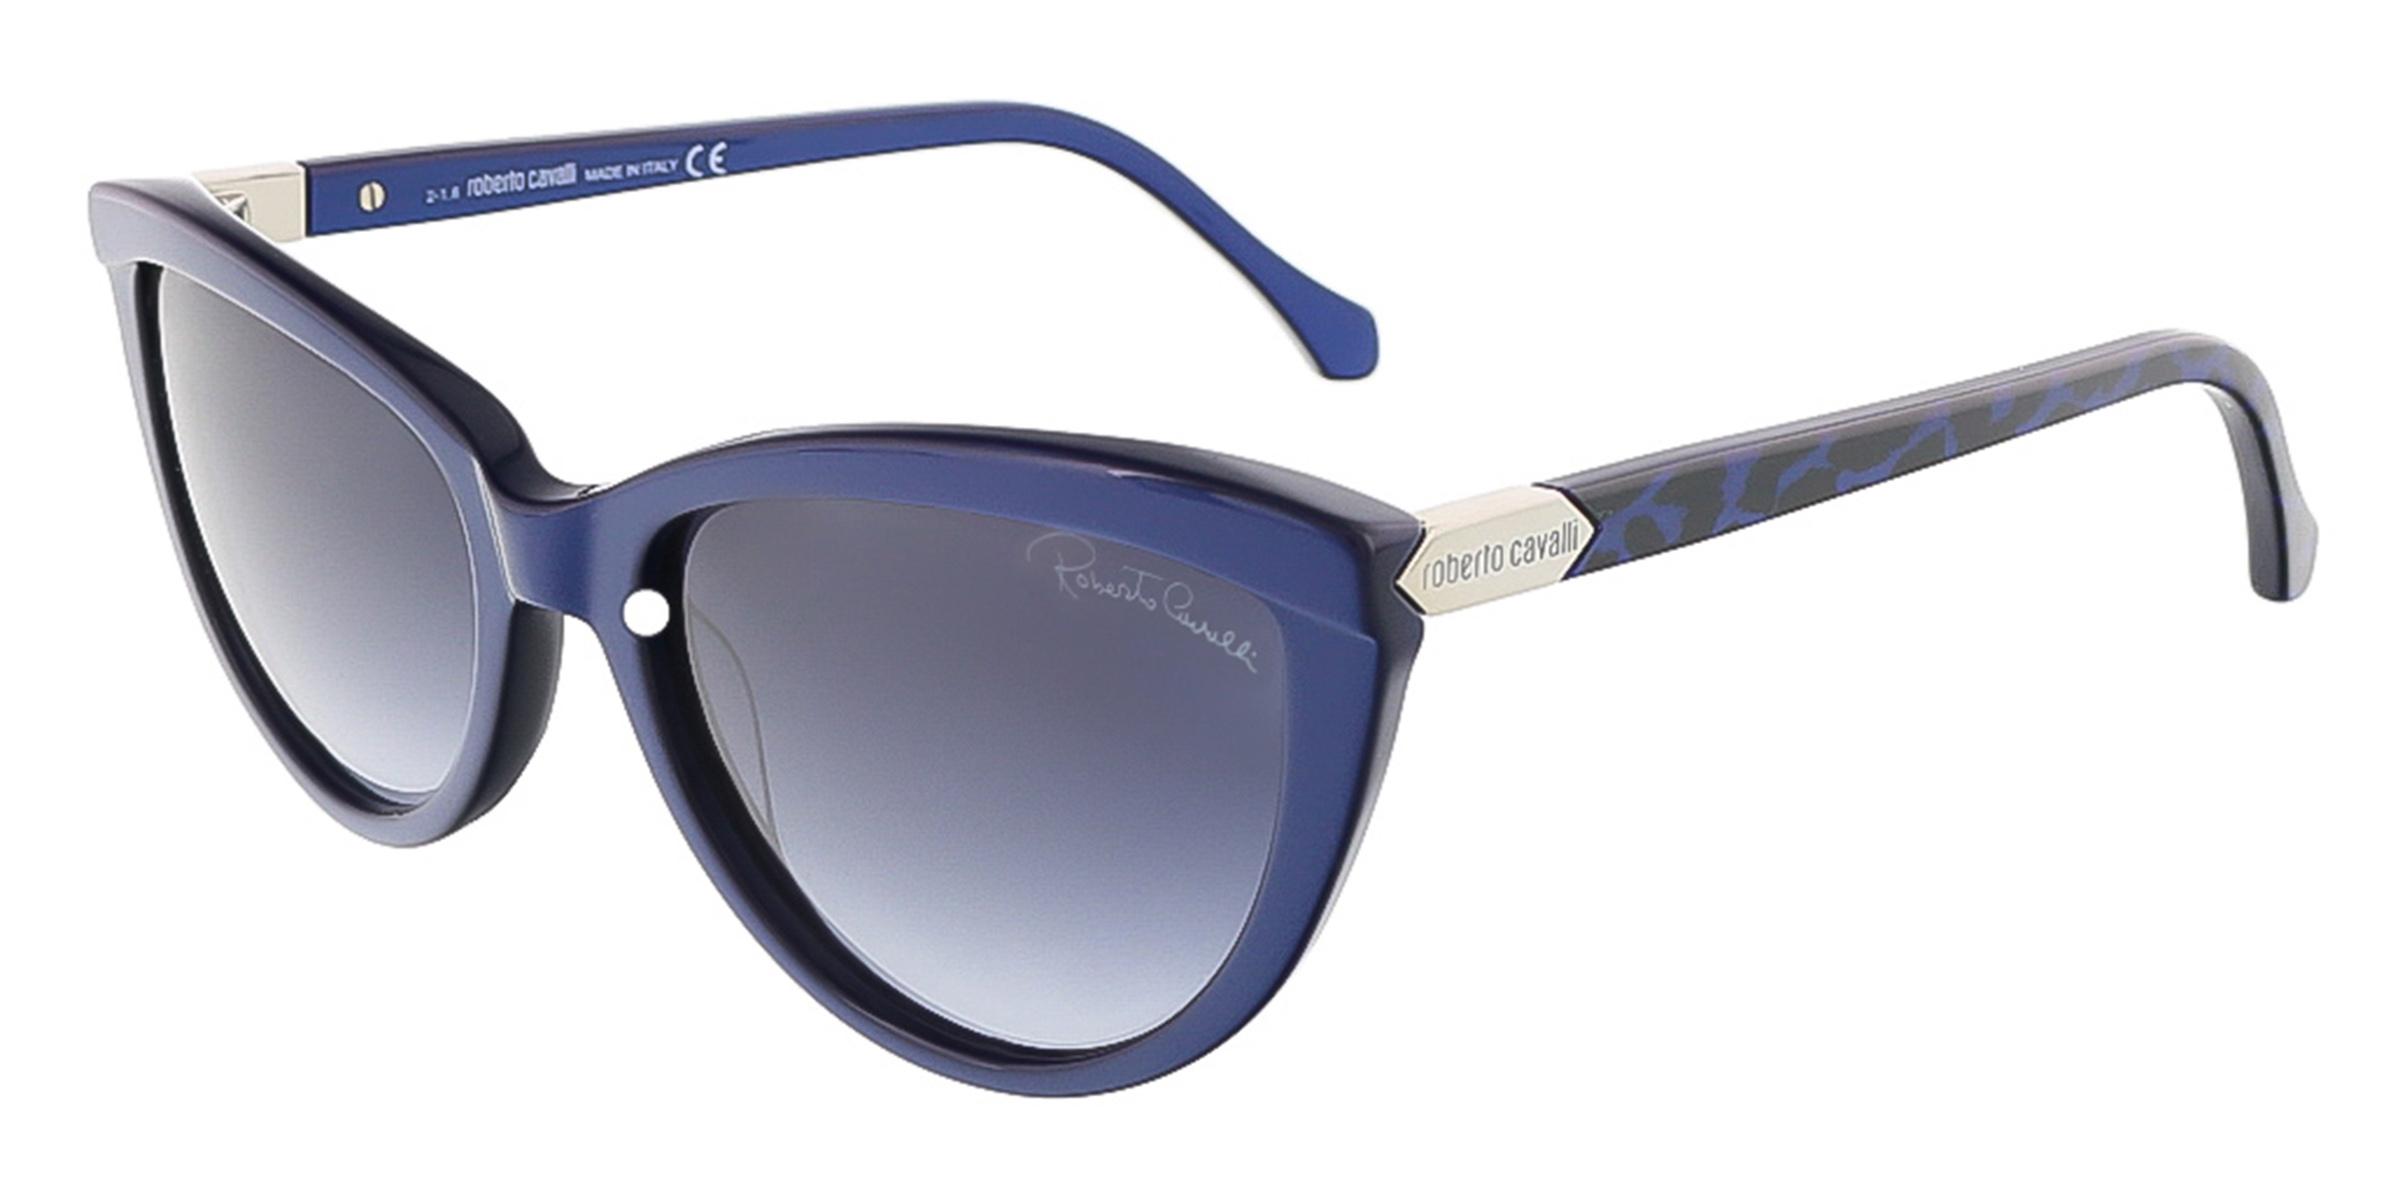 Roberto Cavalli RC787S/S 69W ACHIRD Shiny Blue Cateye sunglasses